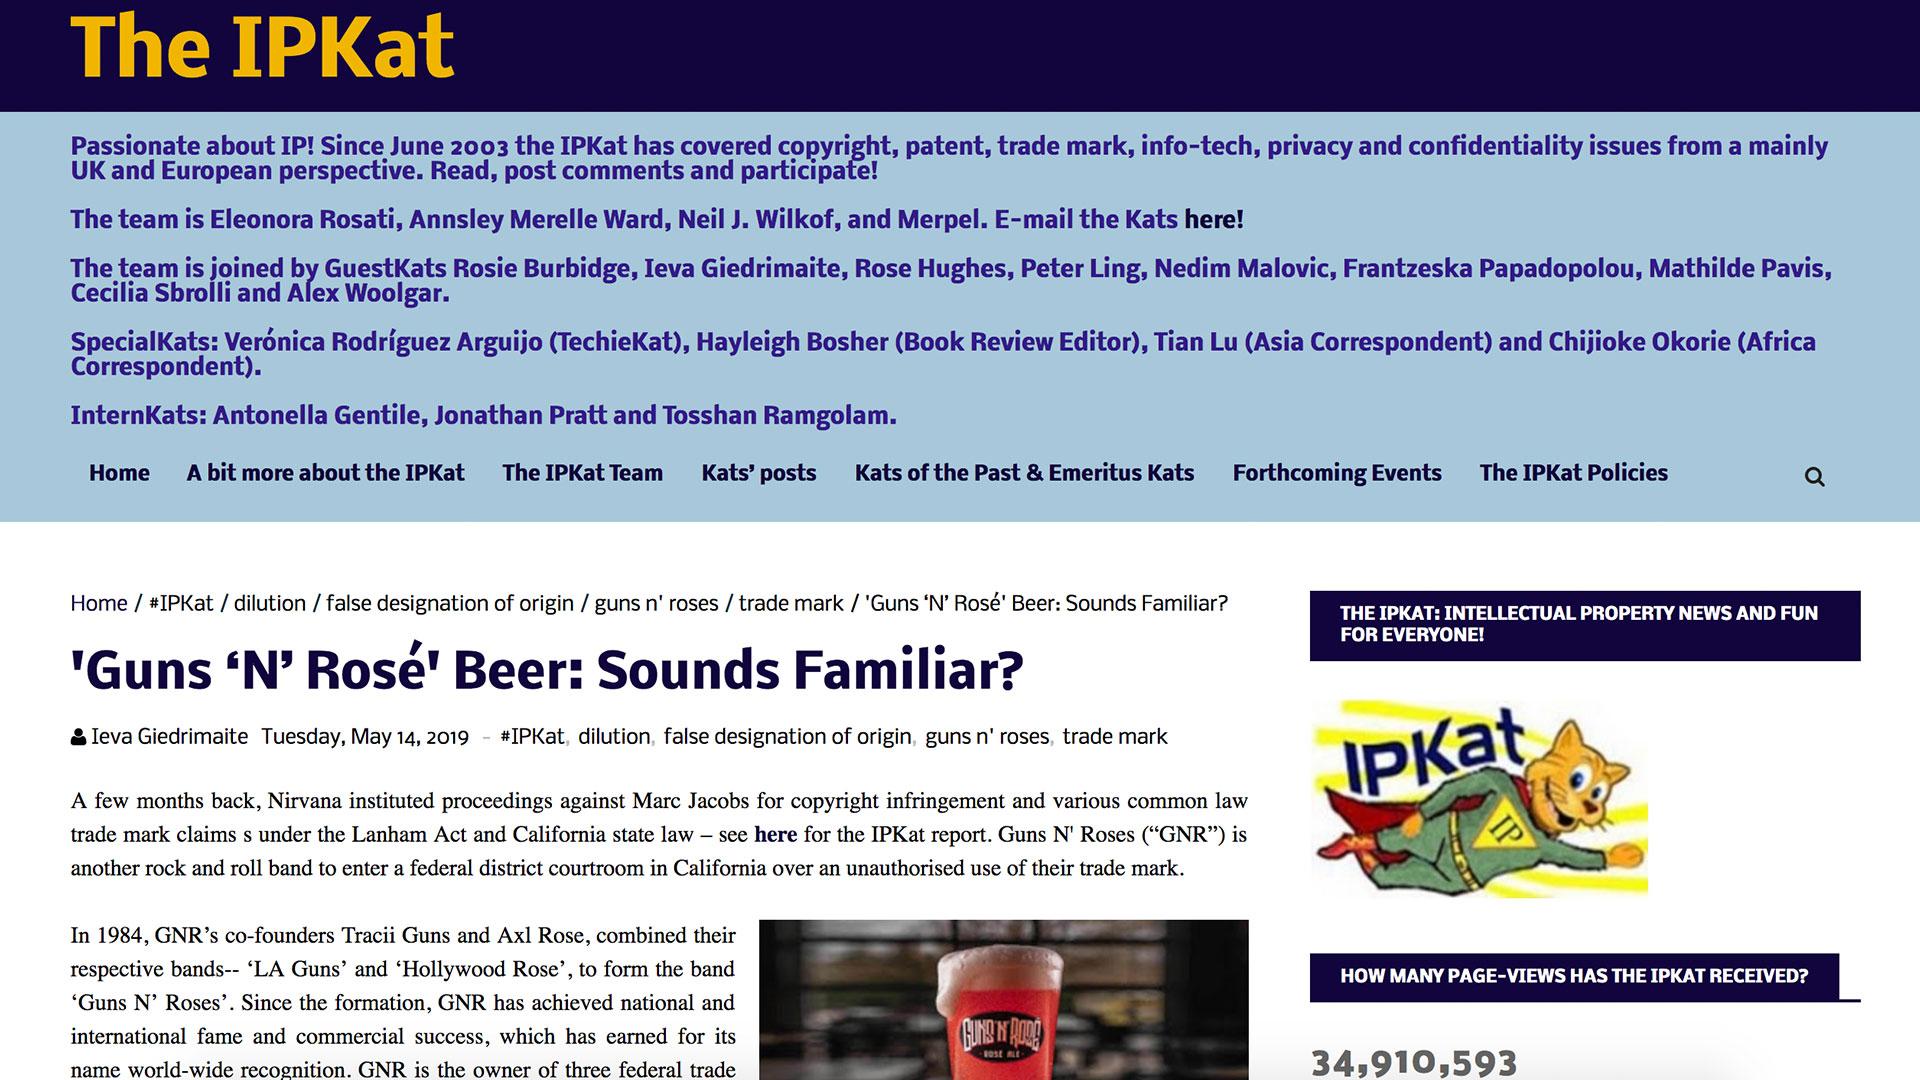 Fairness Rocks News 'Guns 'N' Rosé' Beer: Sounds Familiar?